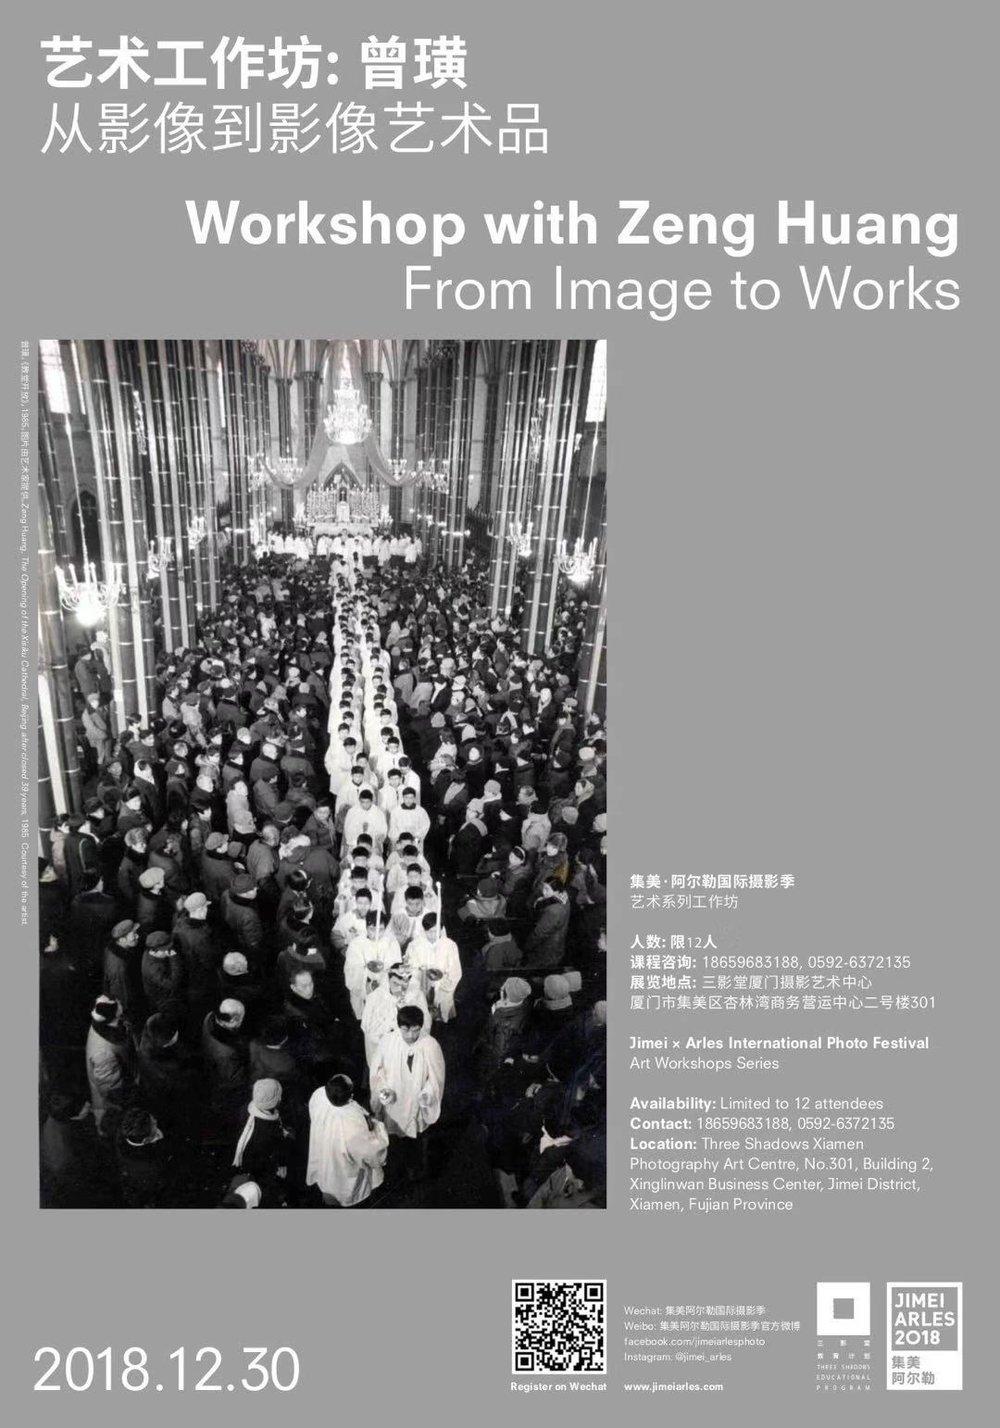 JIMEIARLES_Workshop Poster_Digital_Zeng_Huang.jpeg